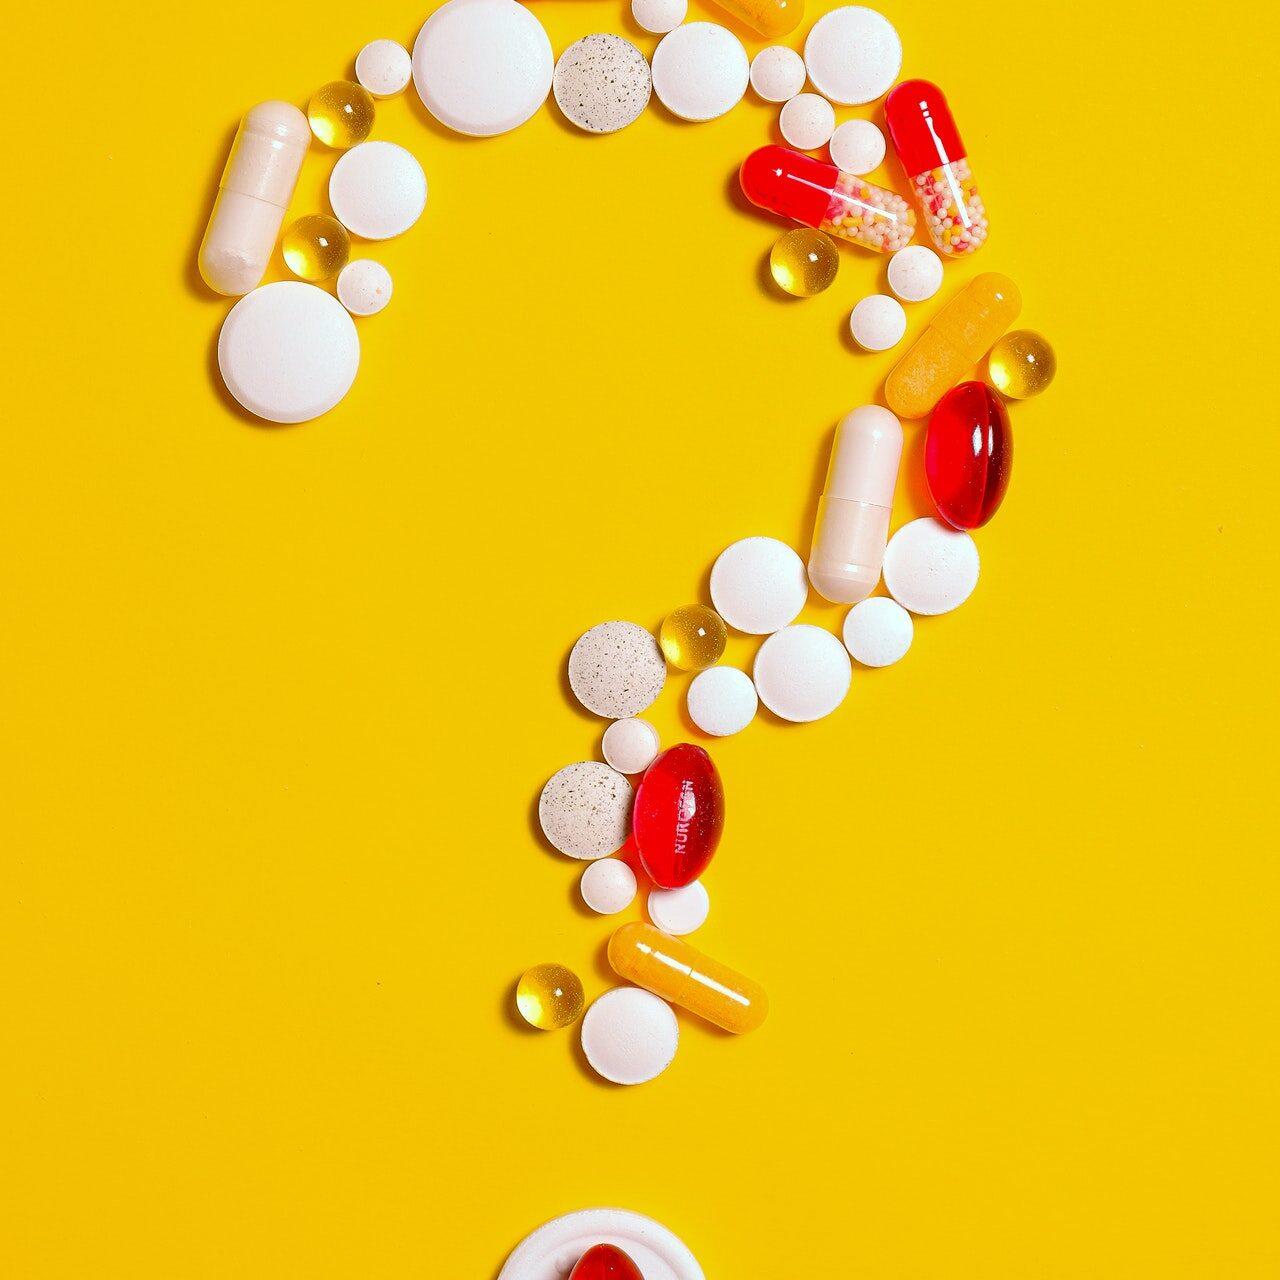 What Causes Drug Addiction